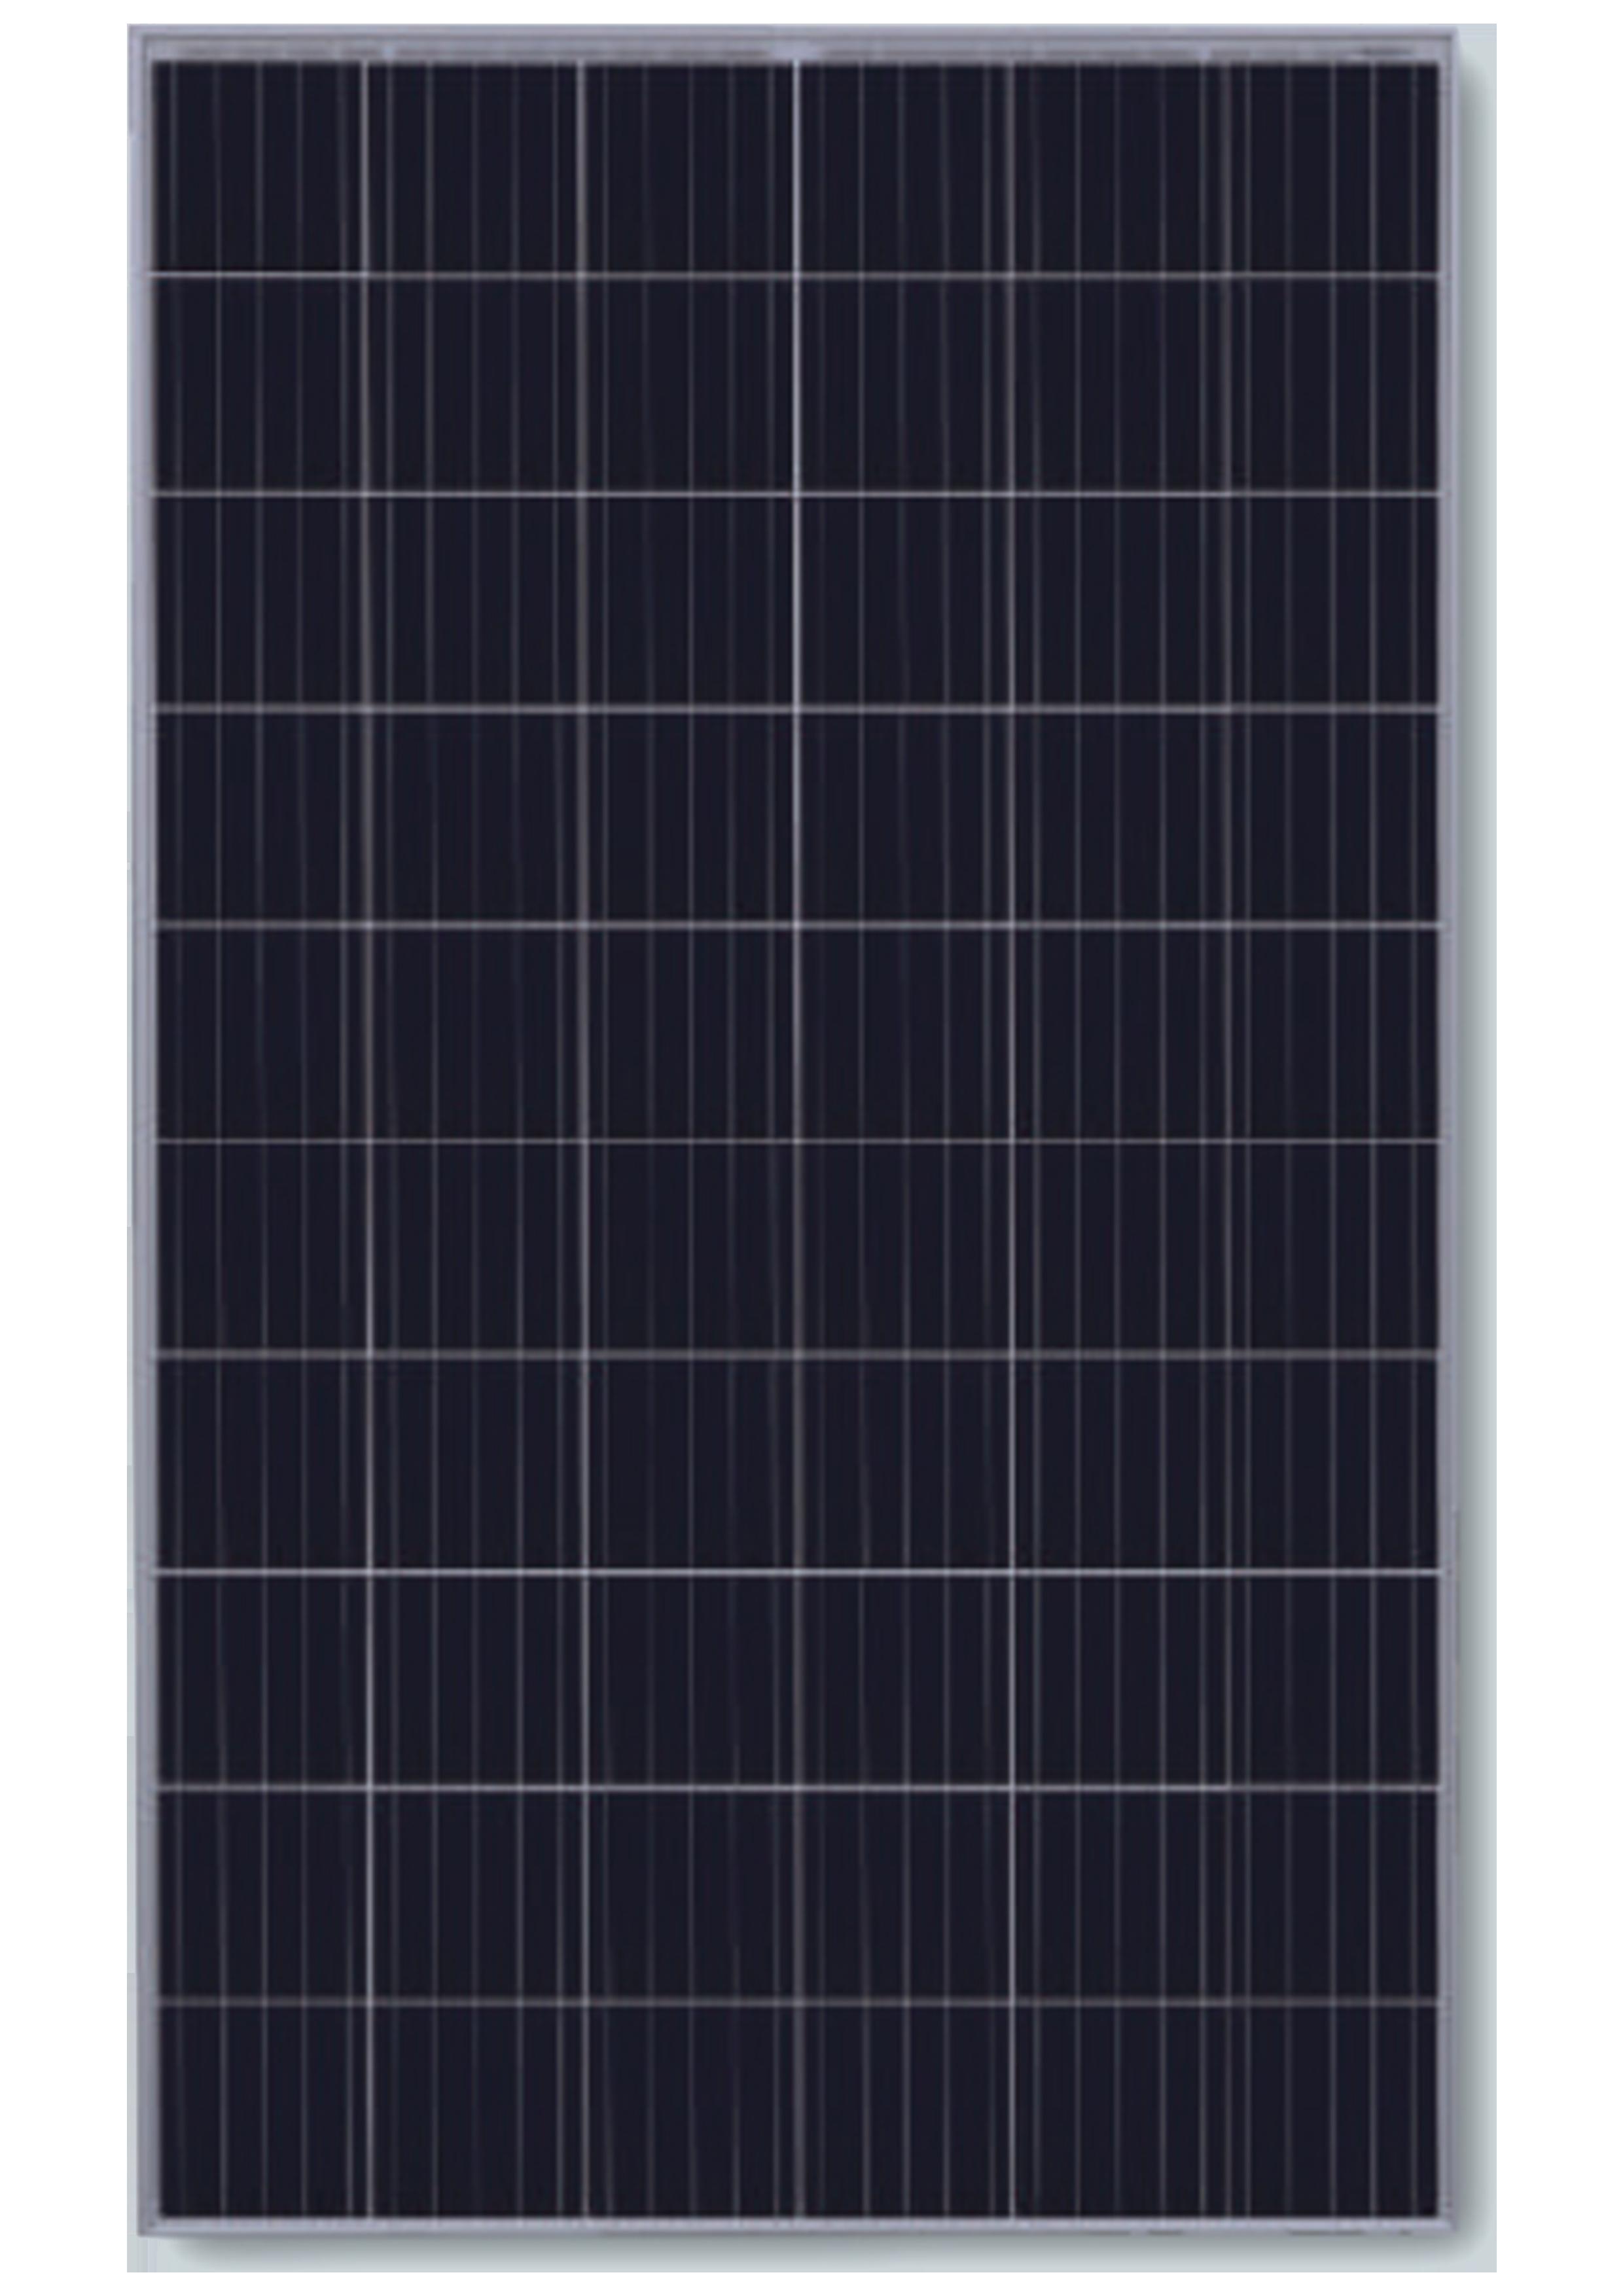 JA Solar 275W